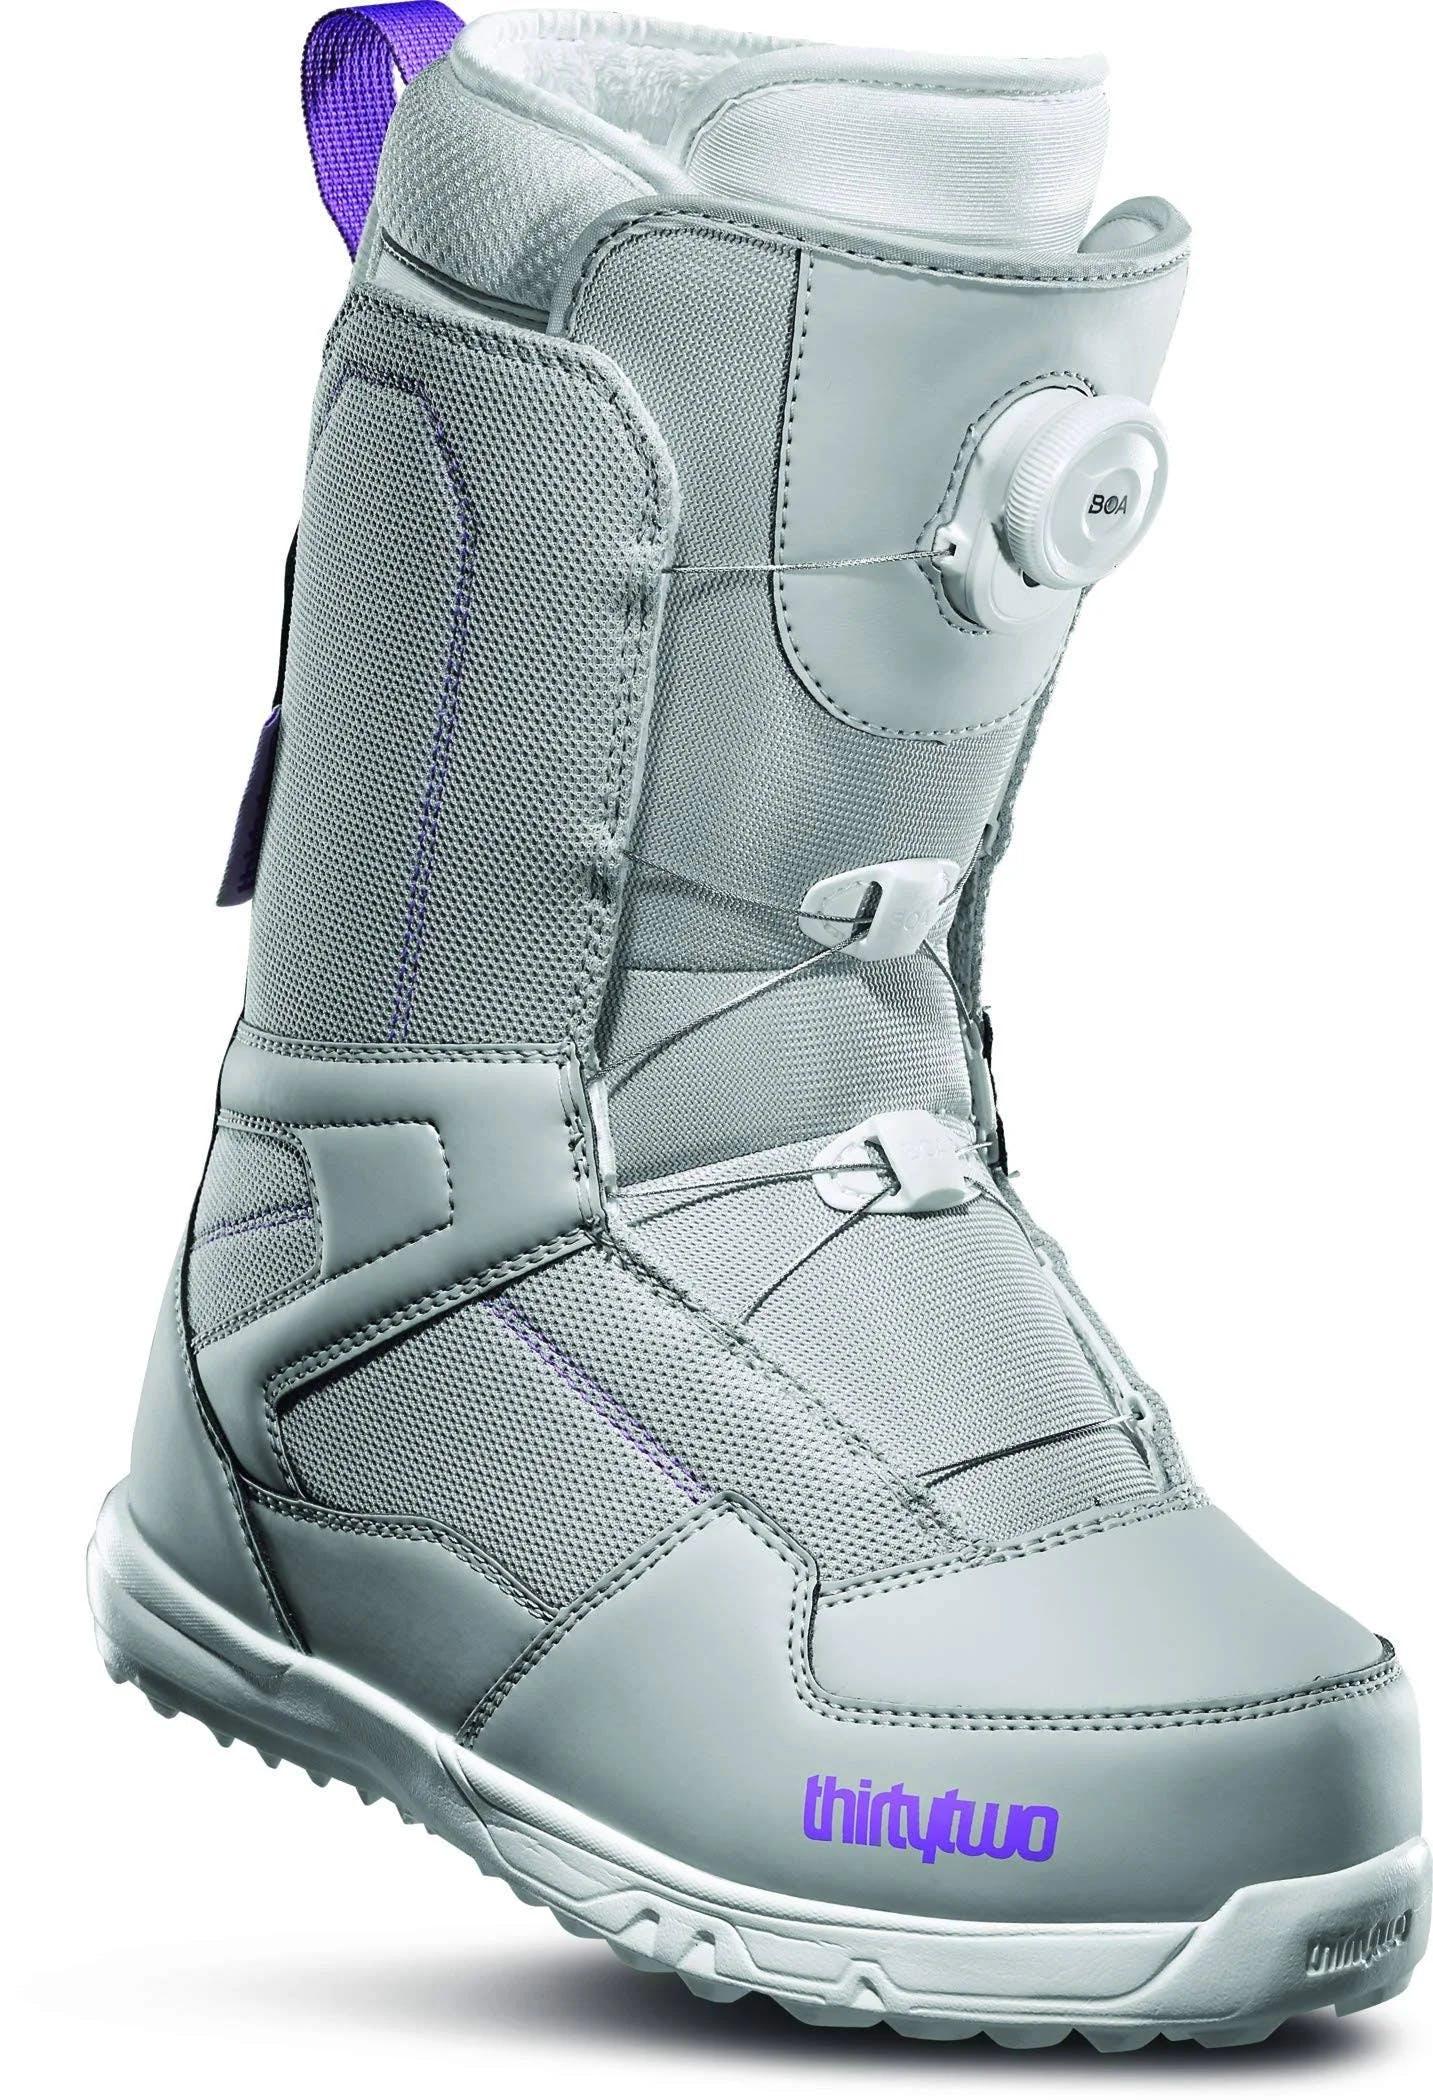 thirtytwo Shifty BOA Snowboard Boots Women's Grey/purple 9.0